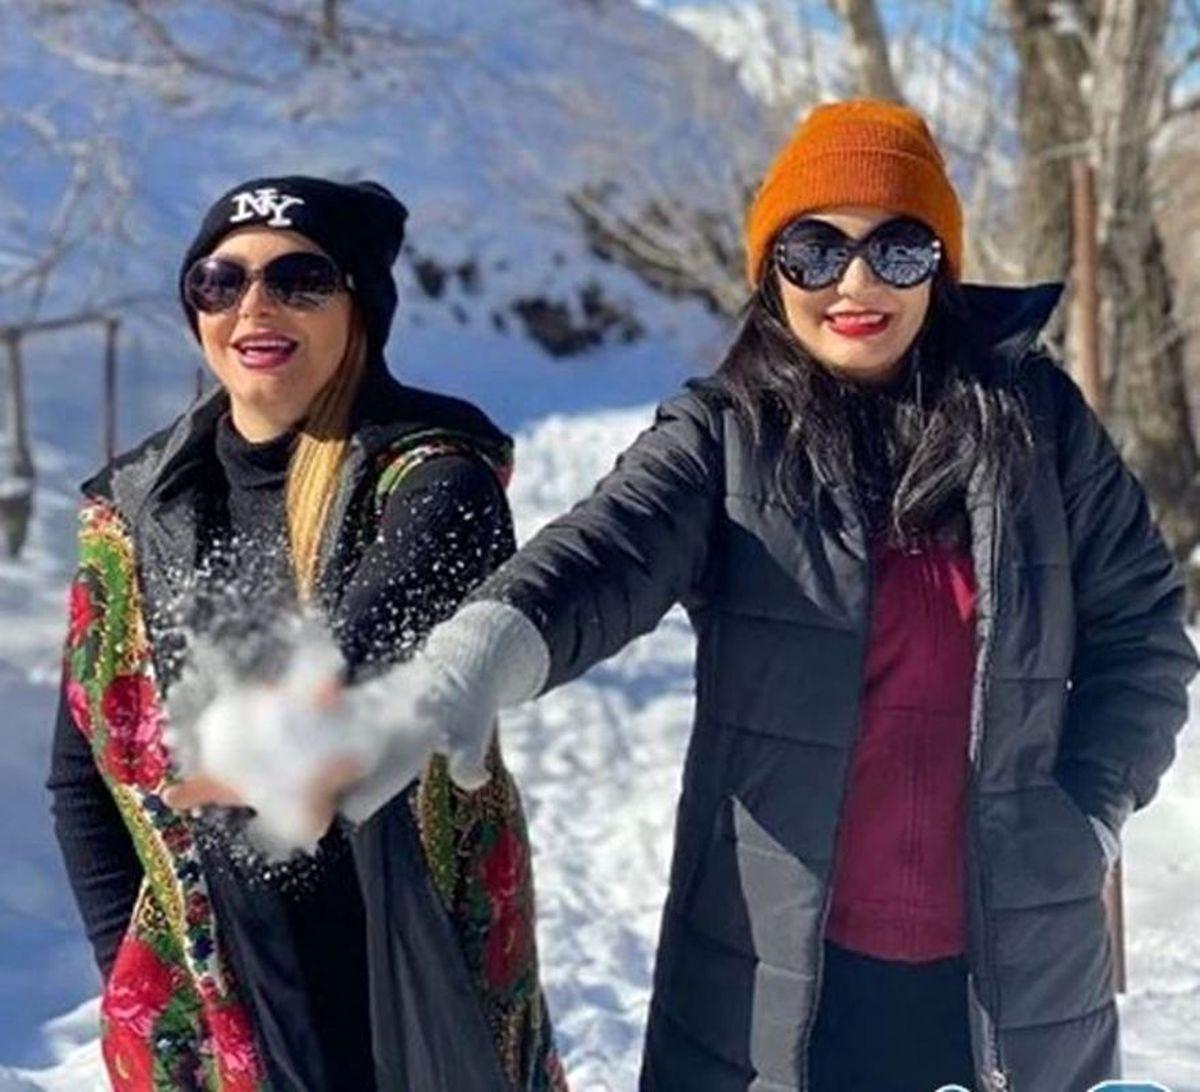 برفبازی و تیپ زمستانی لیندا کیانی + عکس